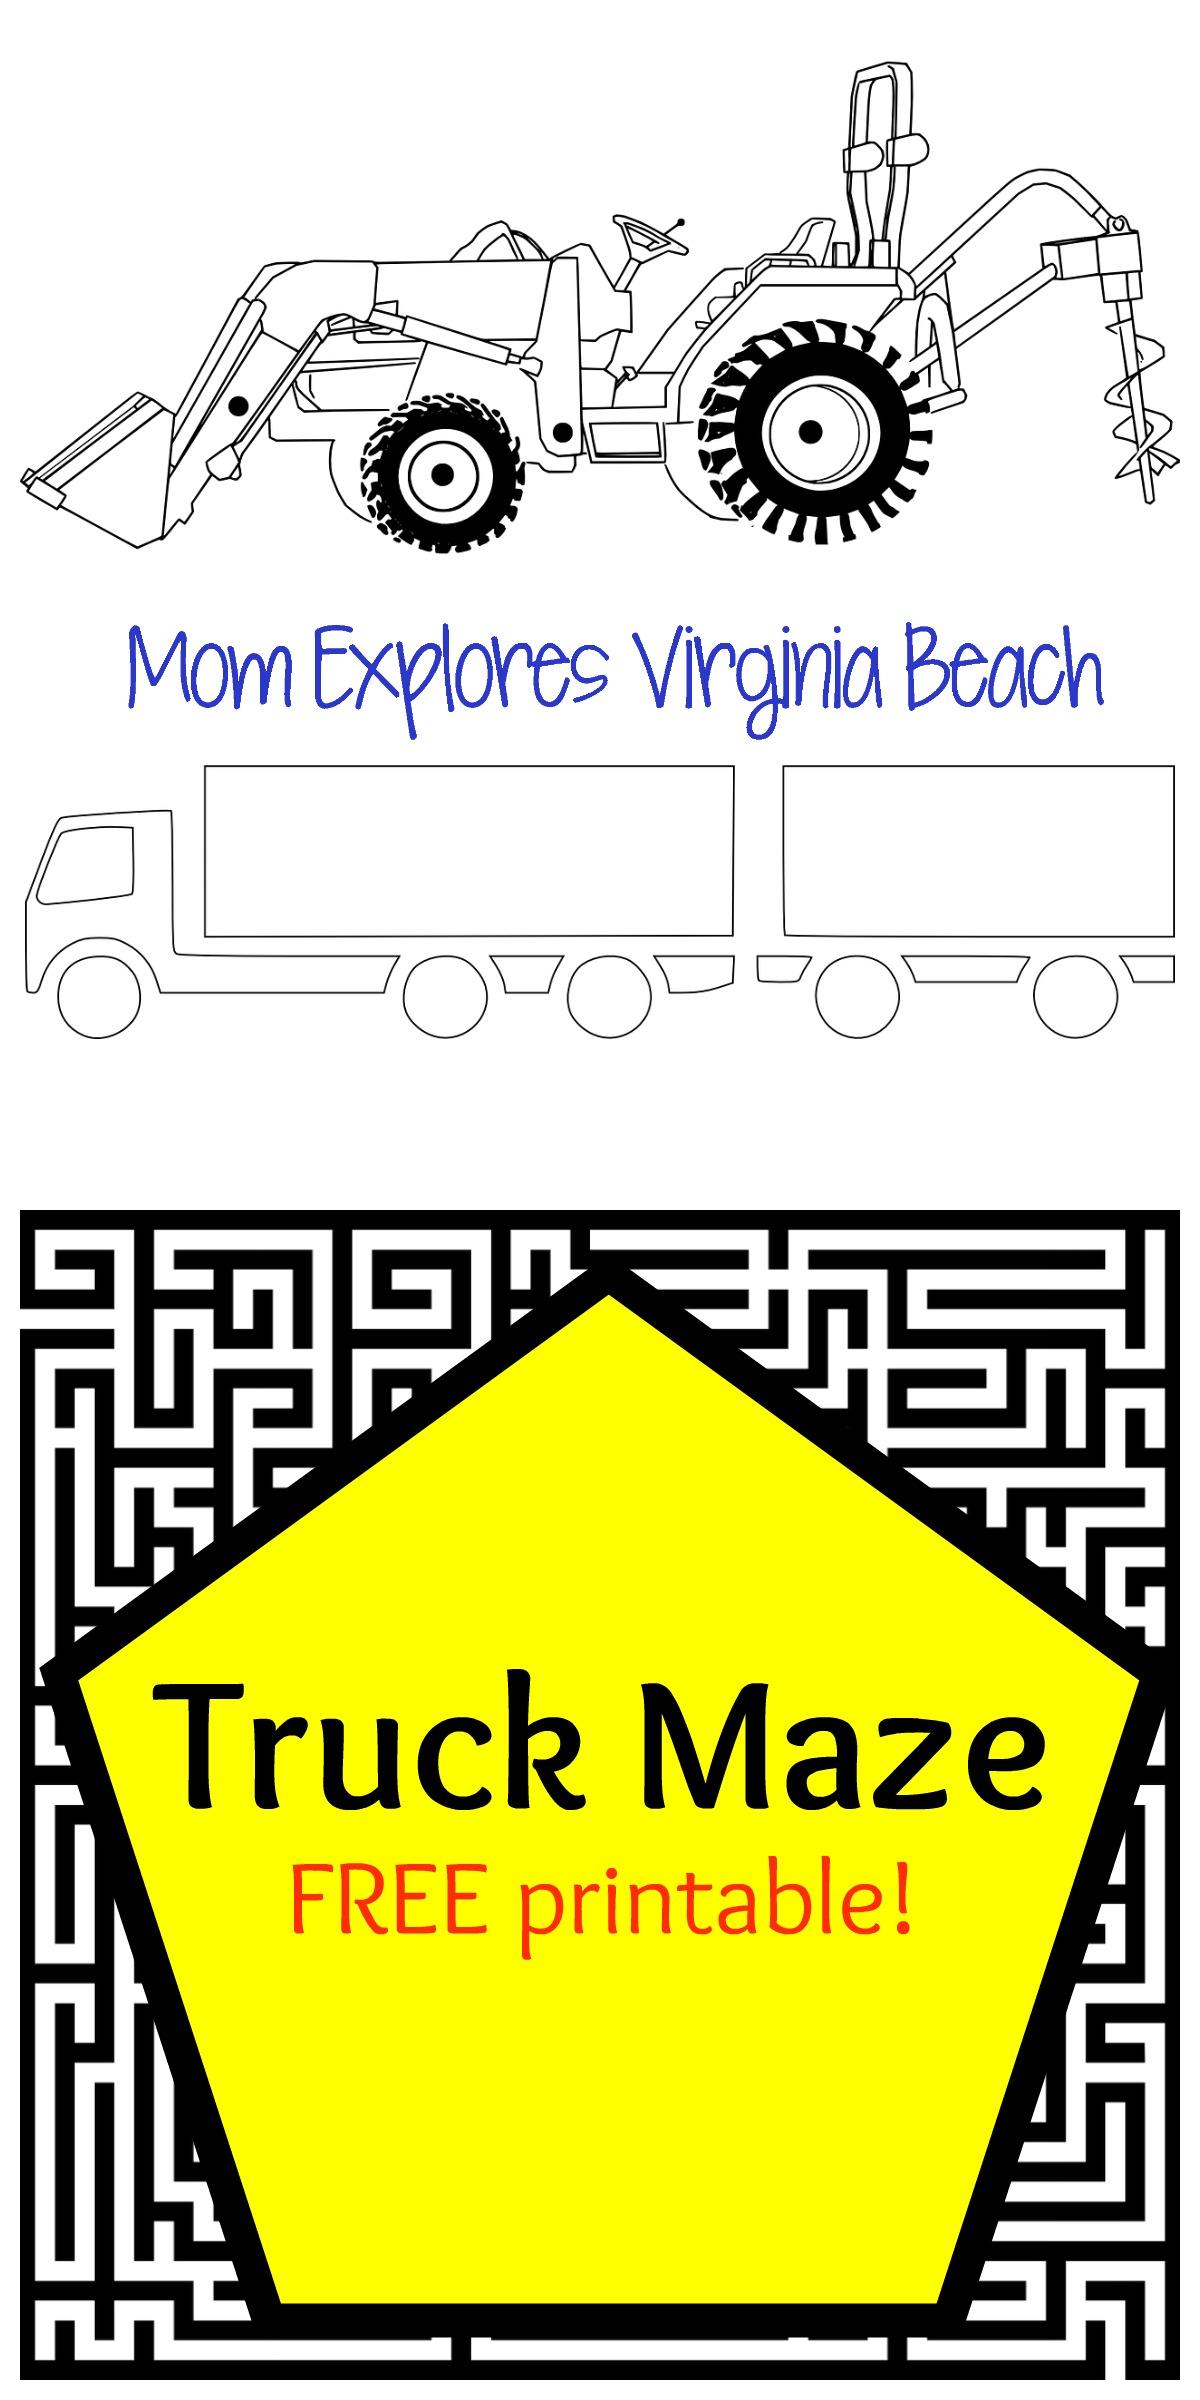 Truck Maze Free Printable